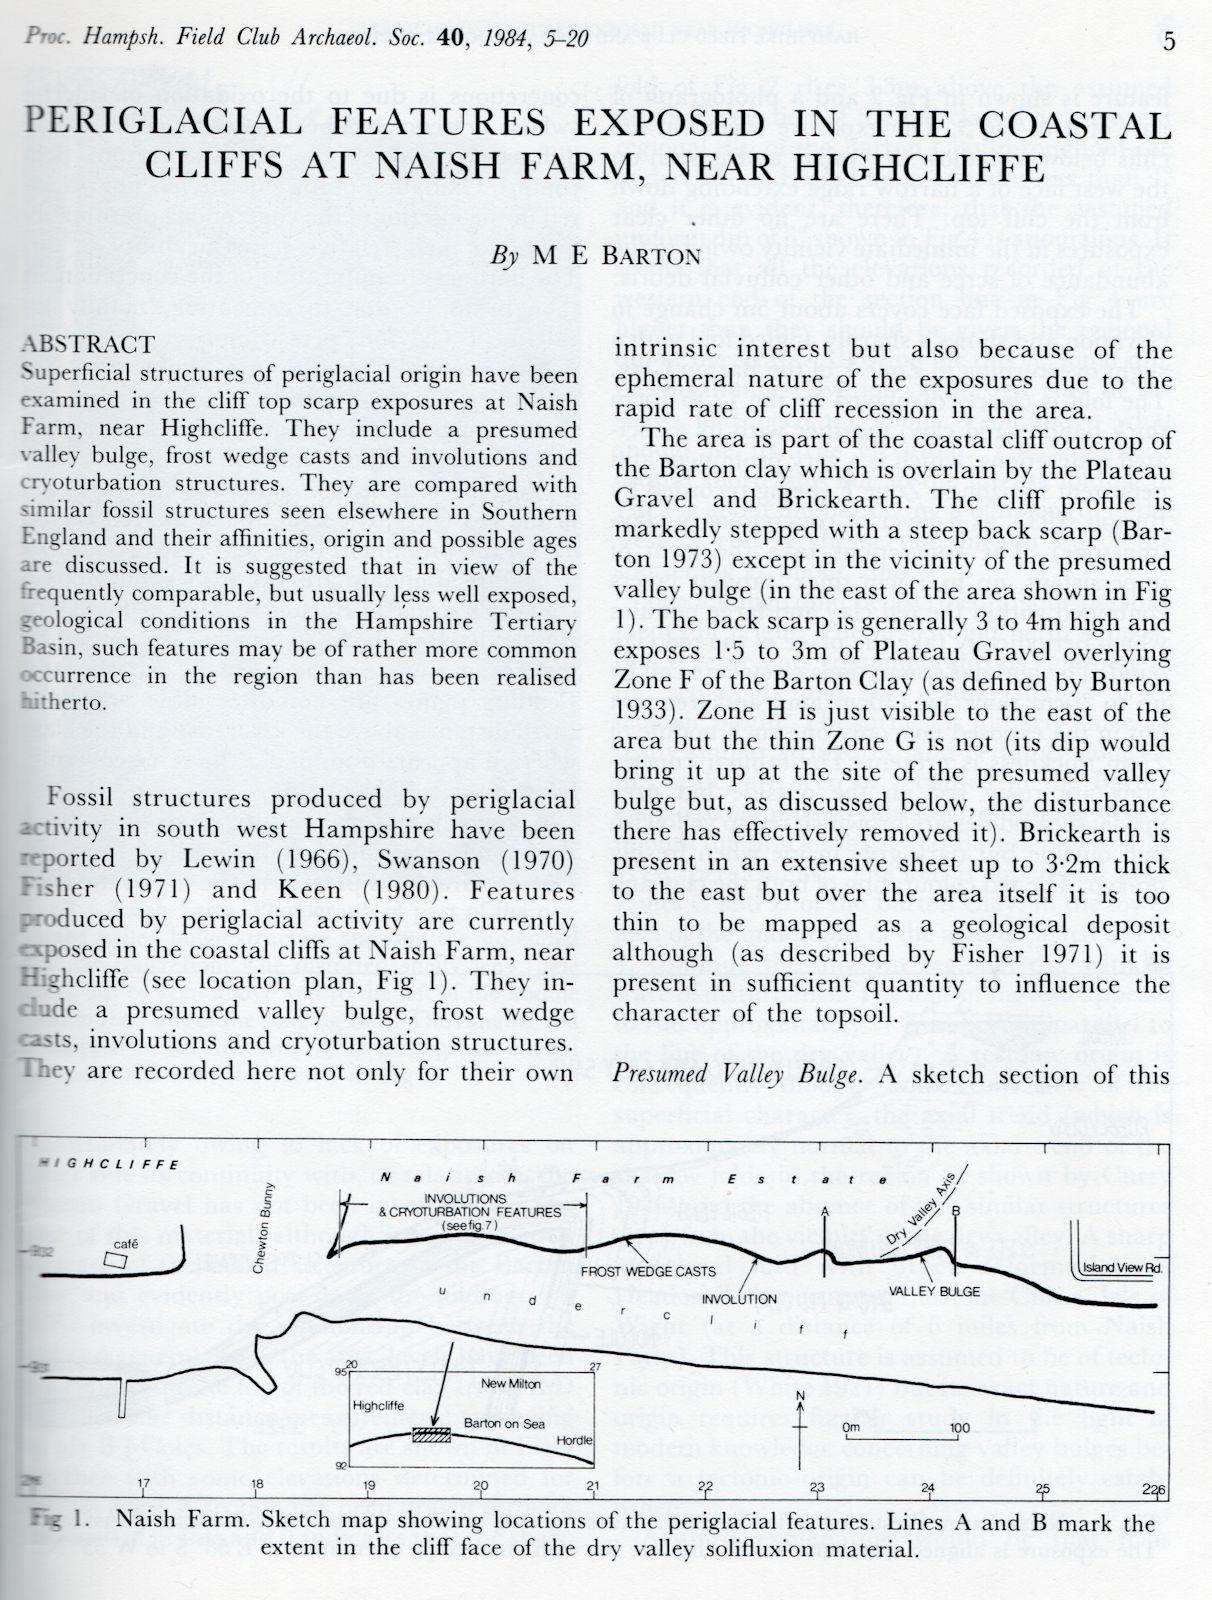 18BT Barton Periglacial finfin